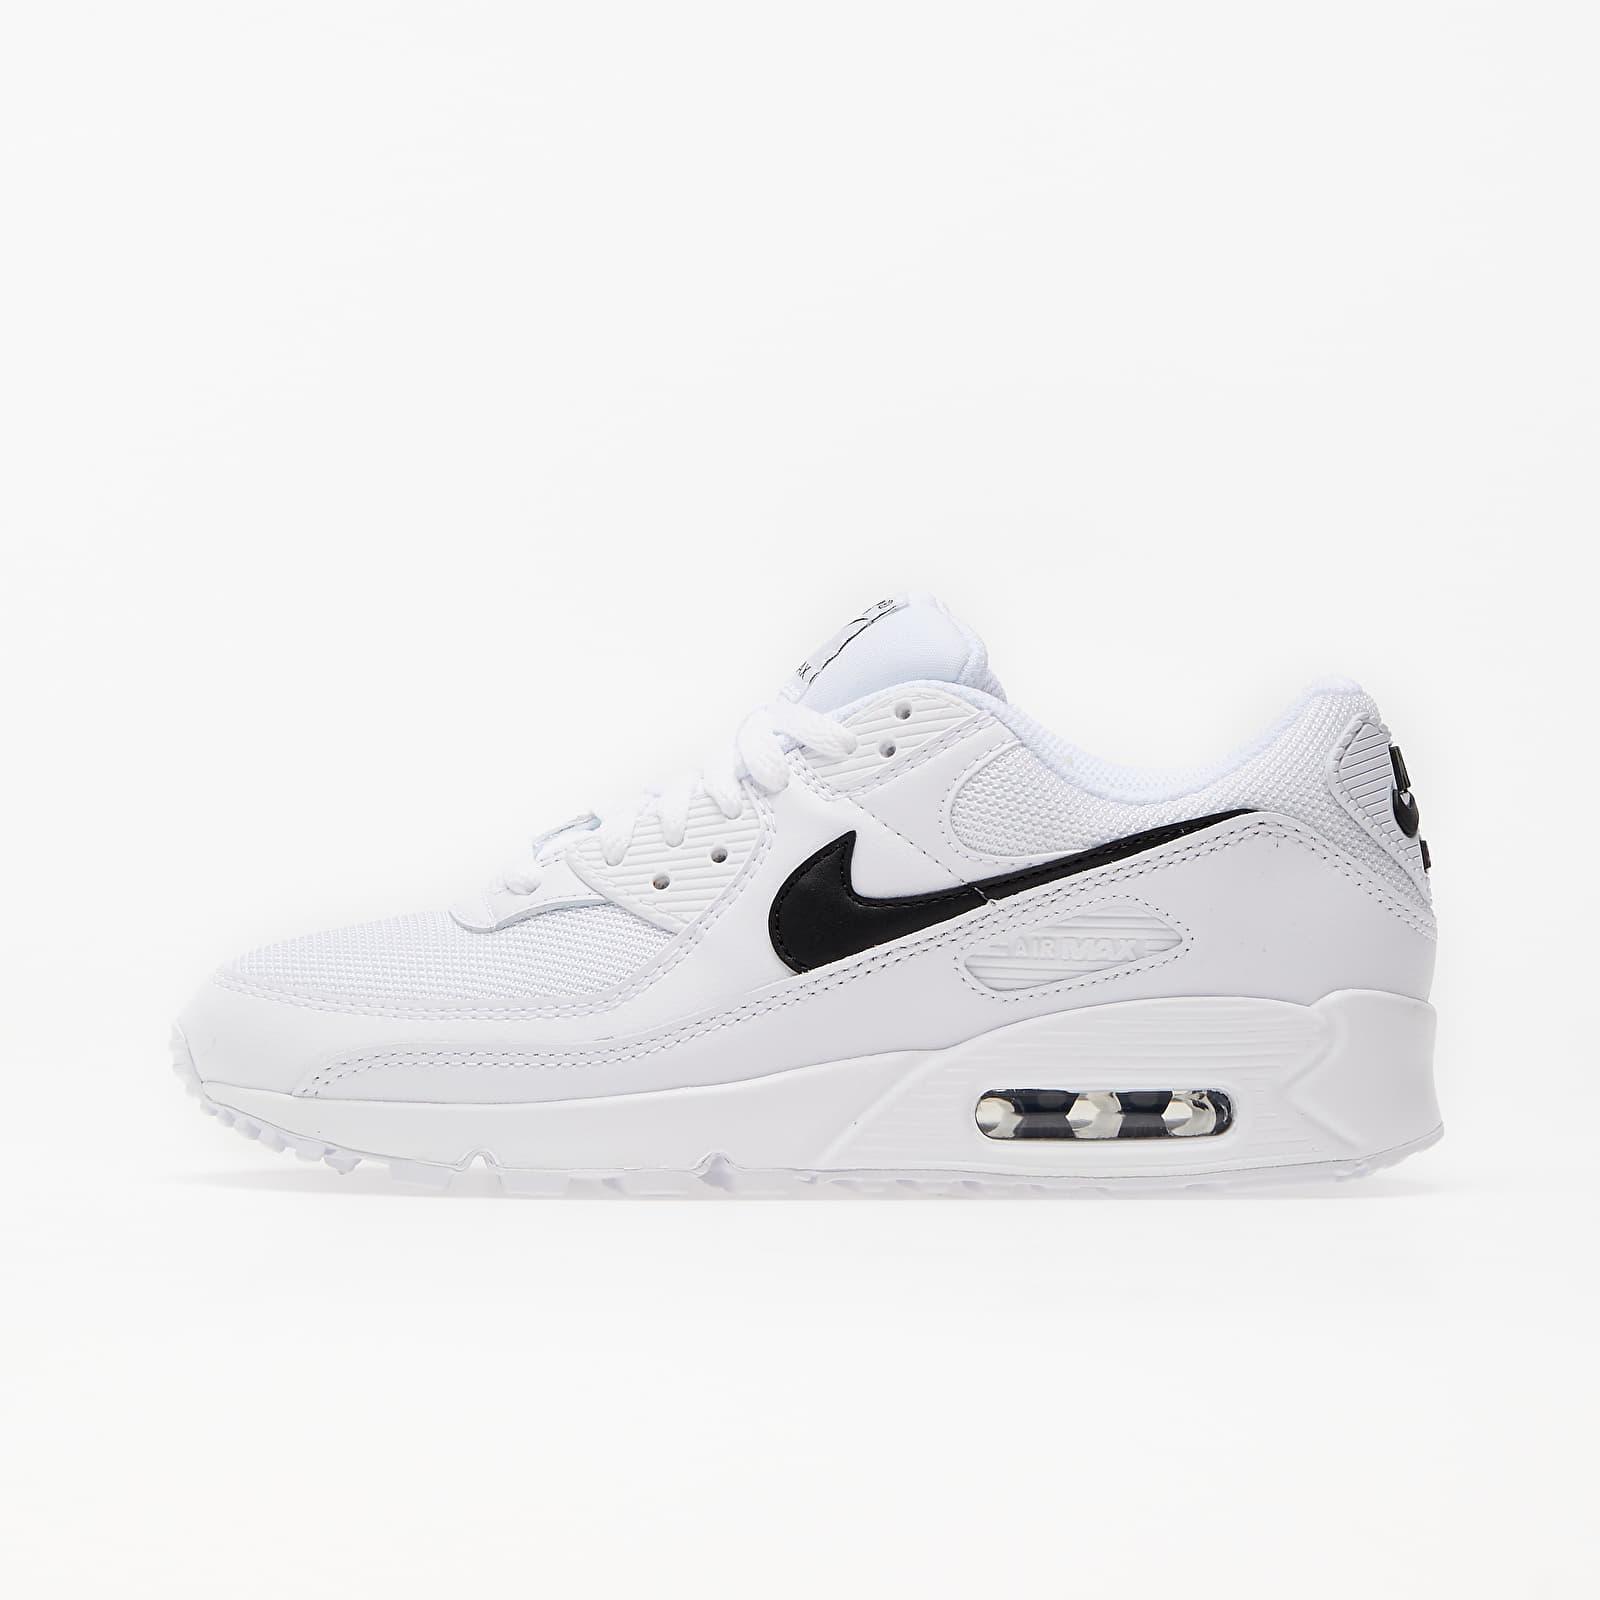 Nike W Air Max 90 White/ Black-White EUR 35.5